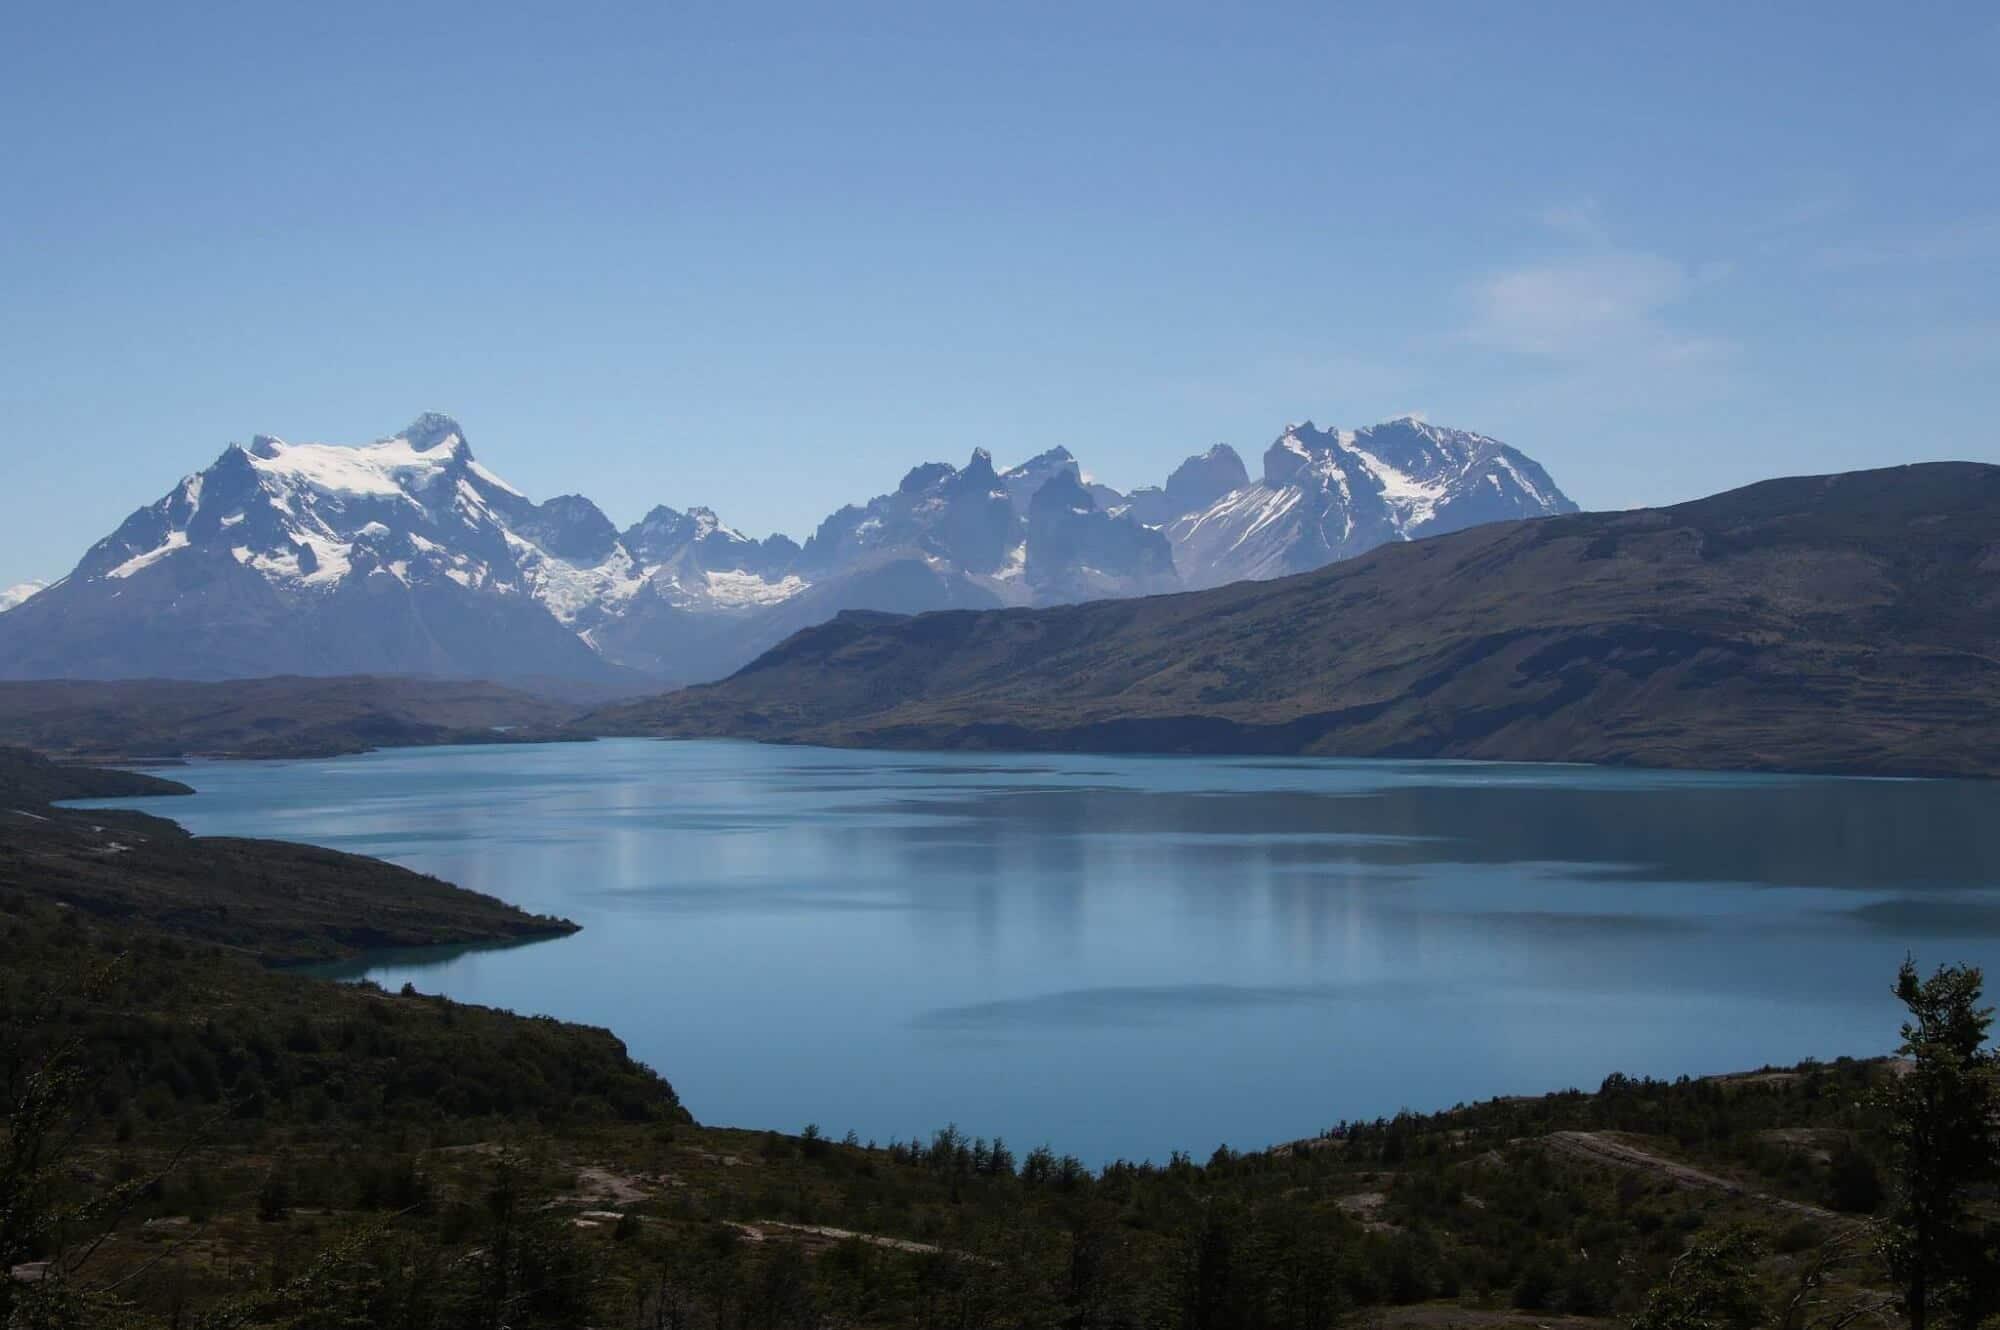 North American Lake